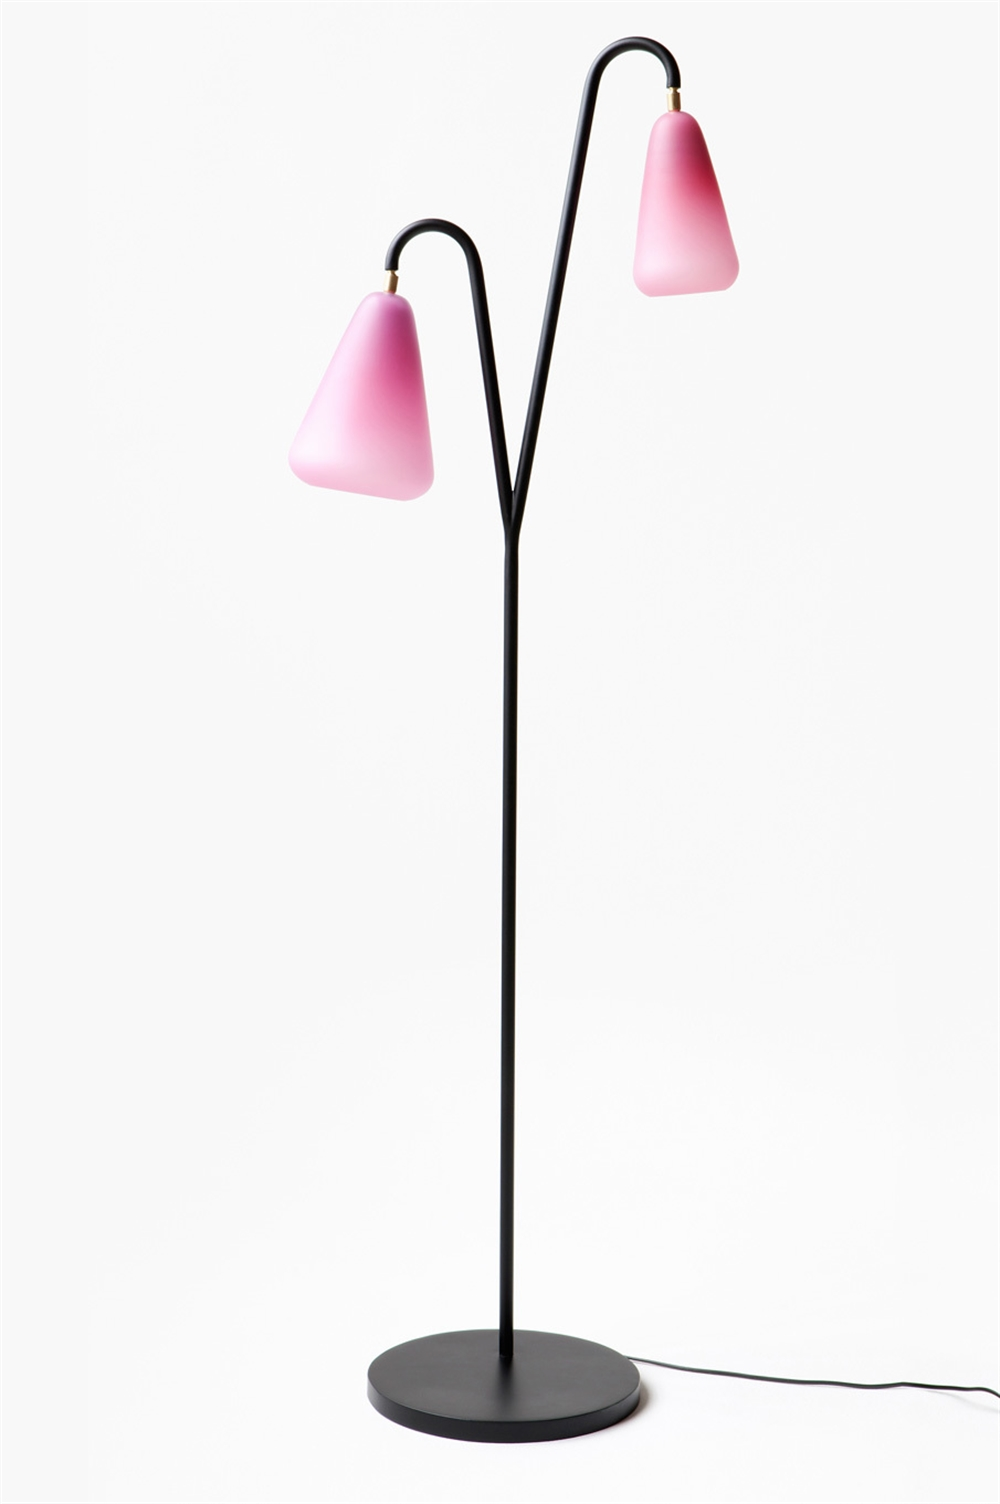 7 maija_puoskari_modern_finnish_design_home_decorating_ideas_scandinavian_style_forelements_blog